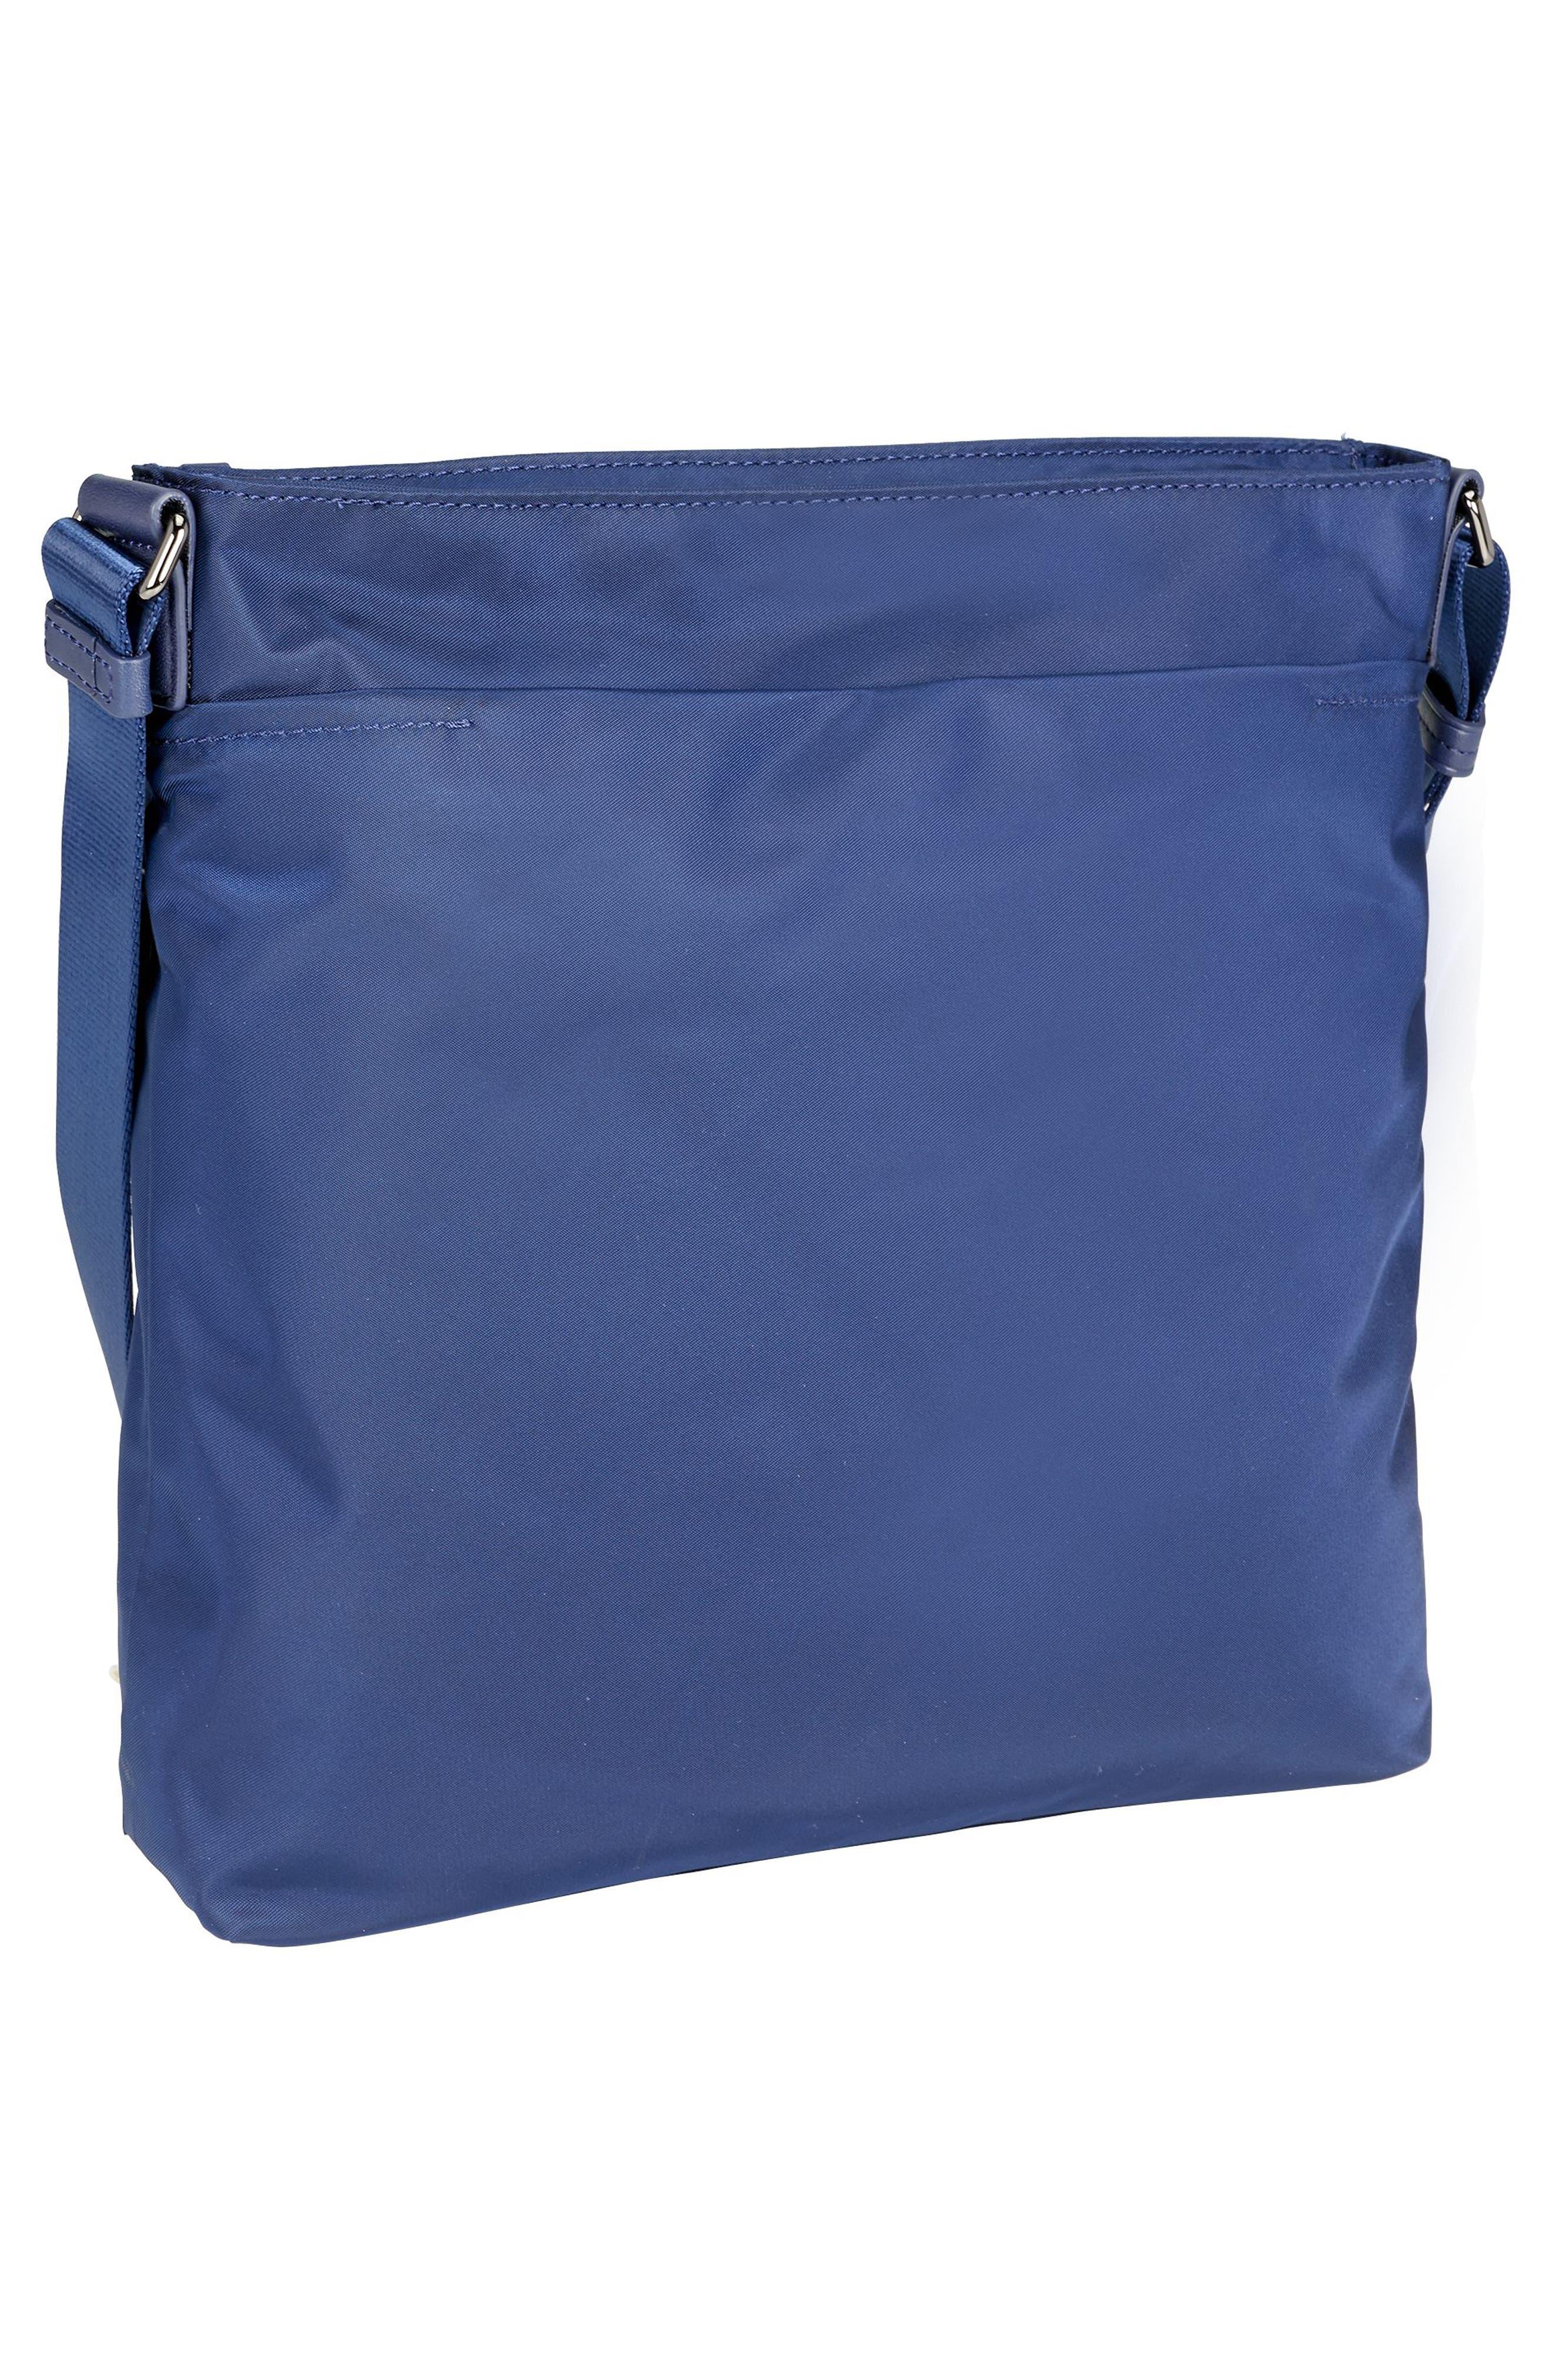 Voyageur - Capri Nylon Crossbody Bag,                             Alternate thumbnail 43, color,